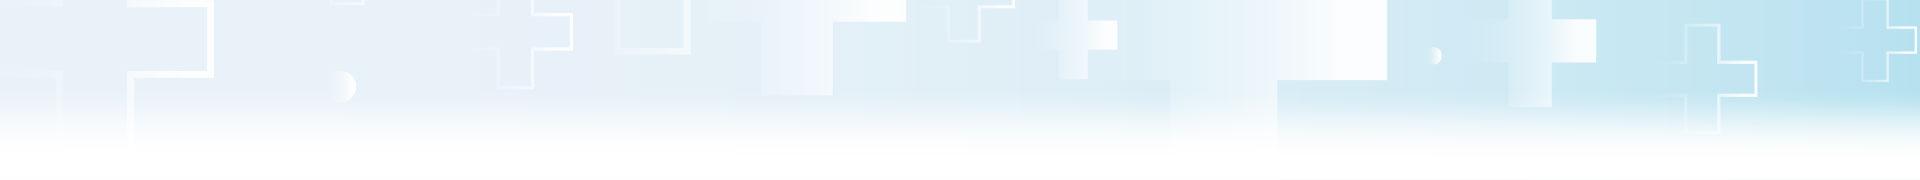 organismo-vigilanza-dispositivi-medici-s2life-180px